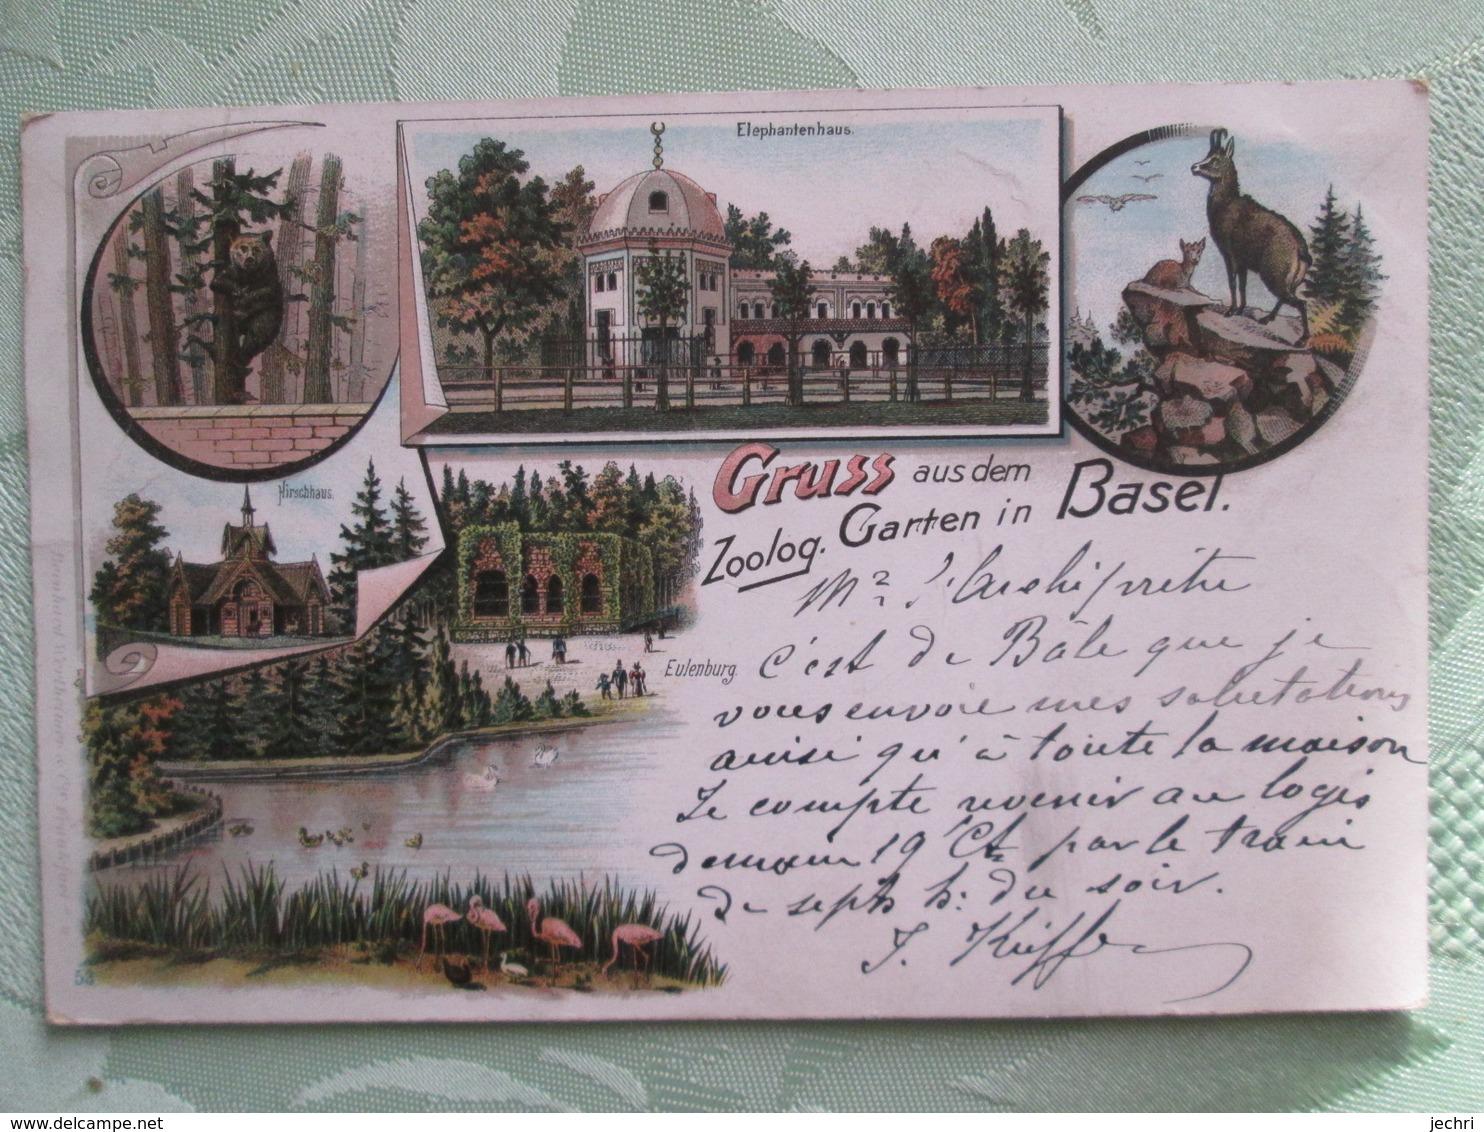 Gruss Aus Dem Zoolog Garten In Basel 1899 - BS Basle-Town